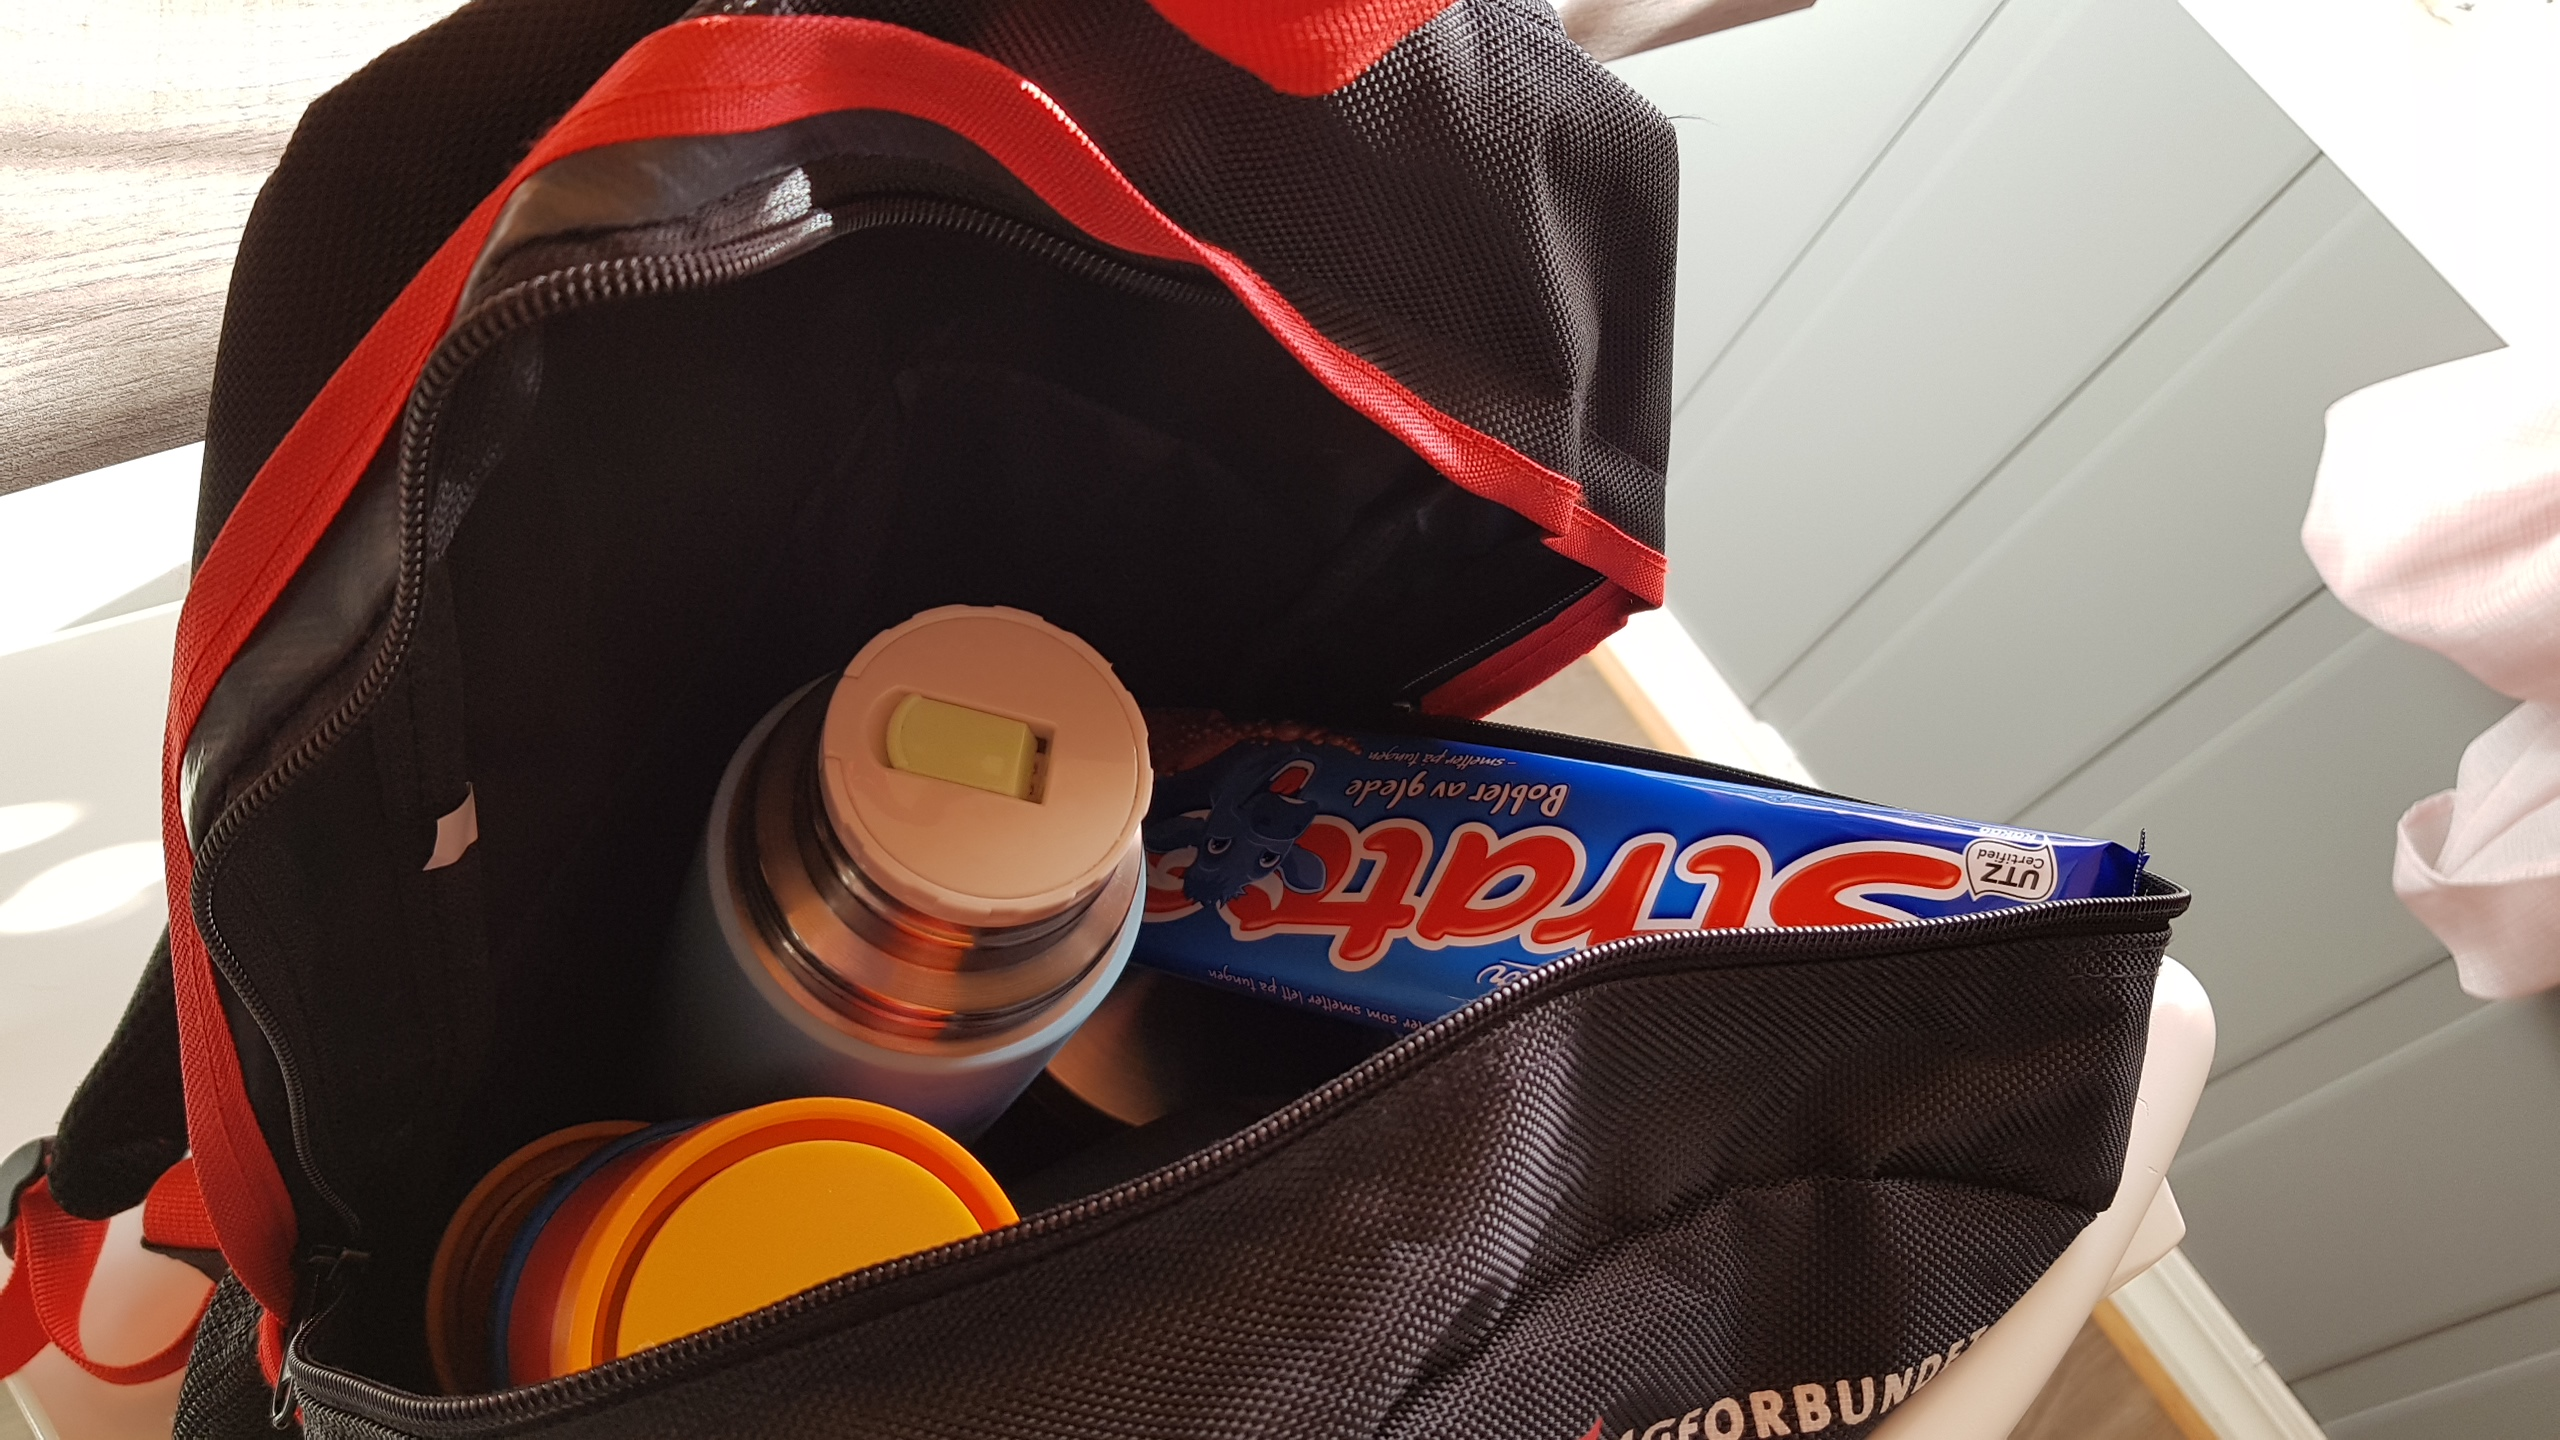 Polaris Sportsman 570. Kaffe og sjokolade.